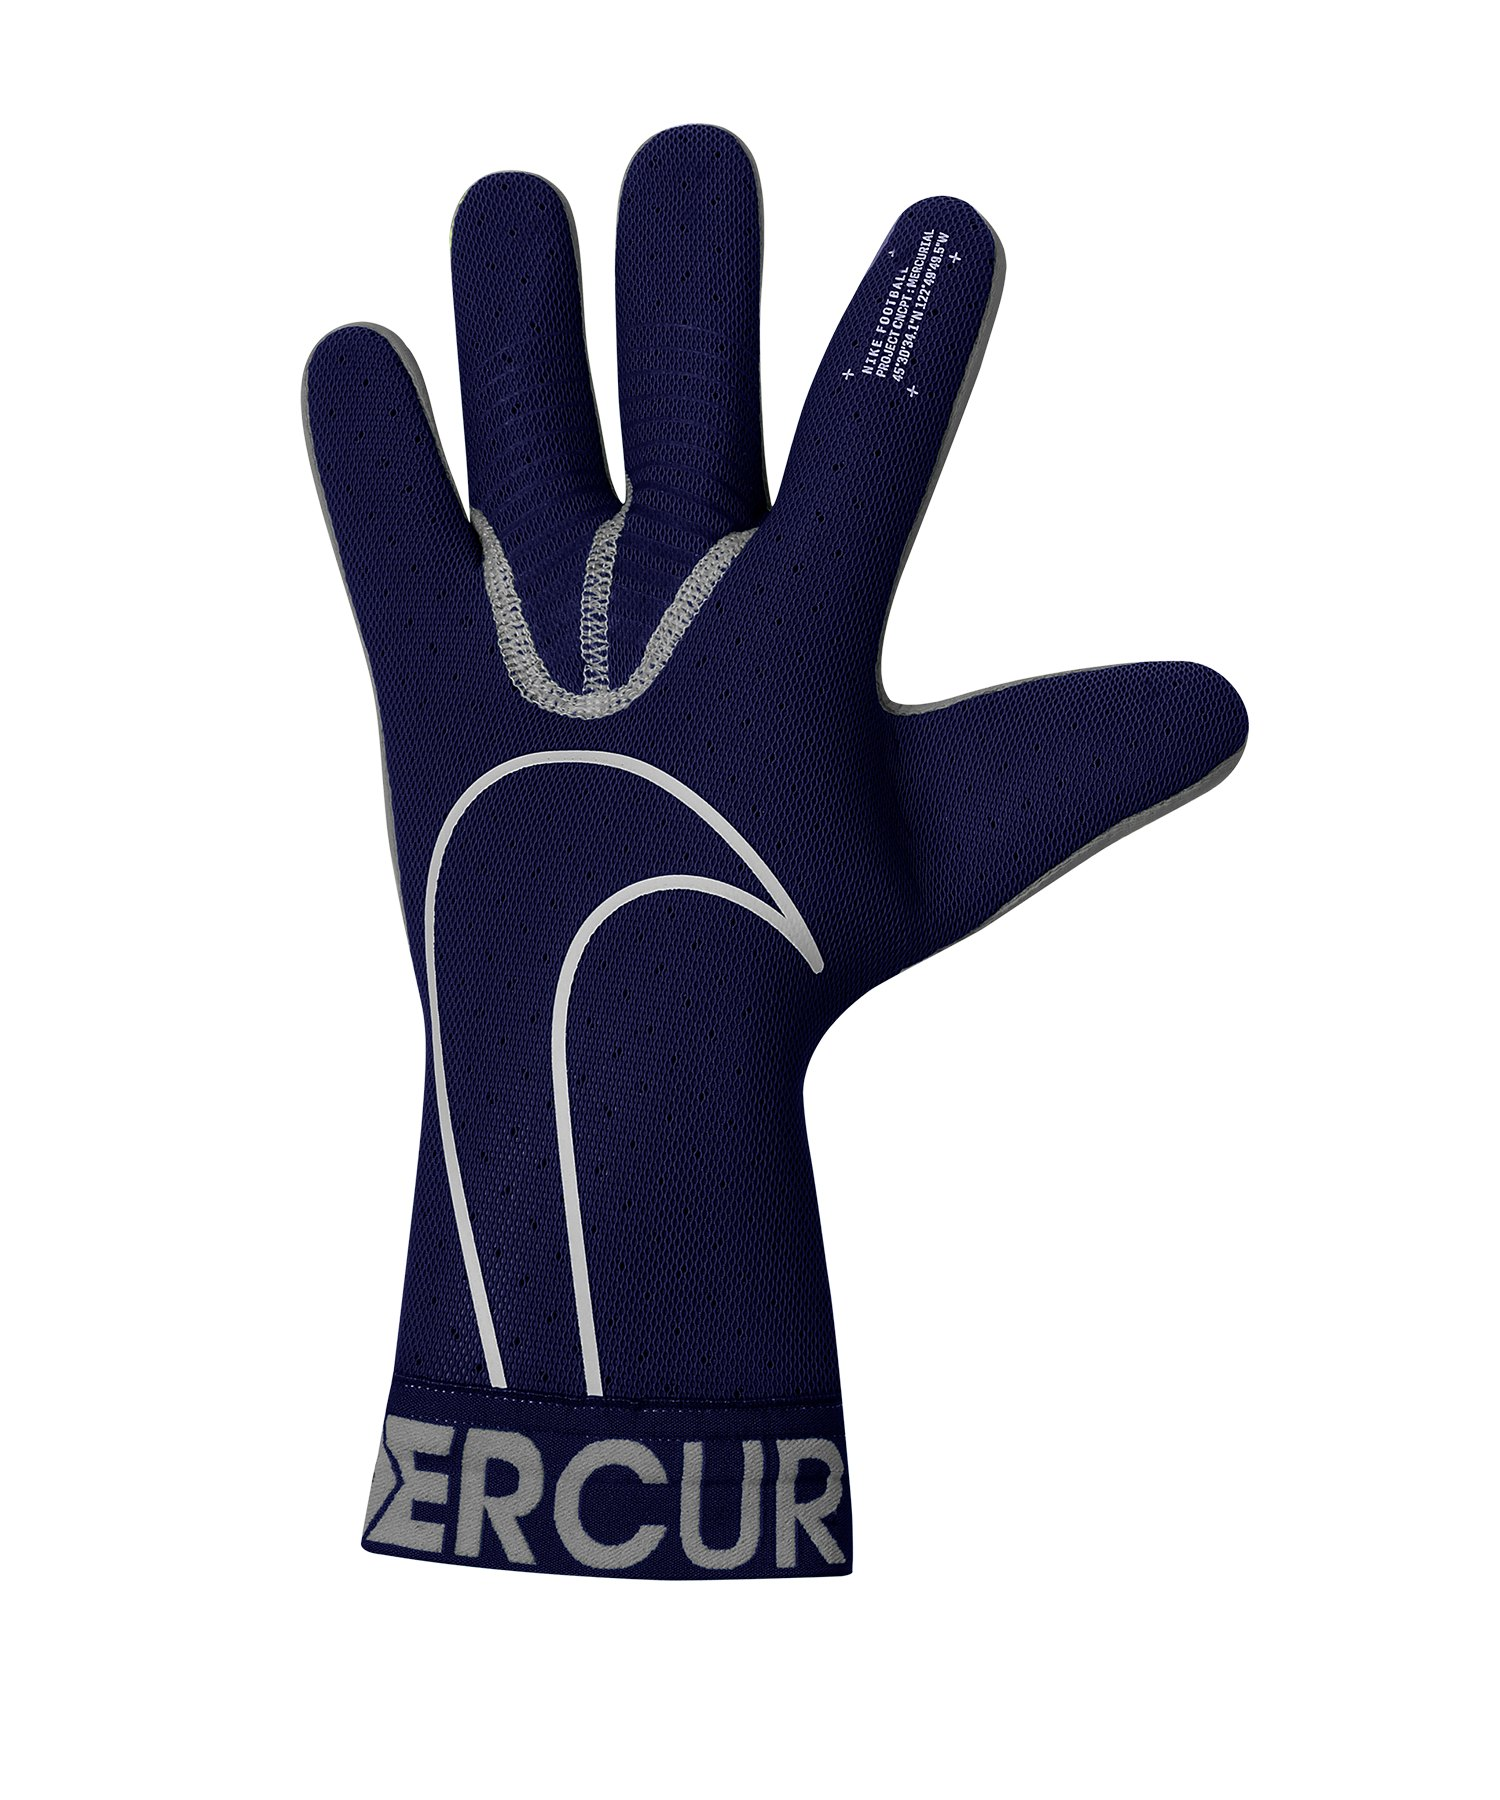 Nike Mercurial Touch Elite TW-Handschuh Blau F492 - blau